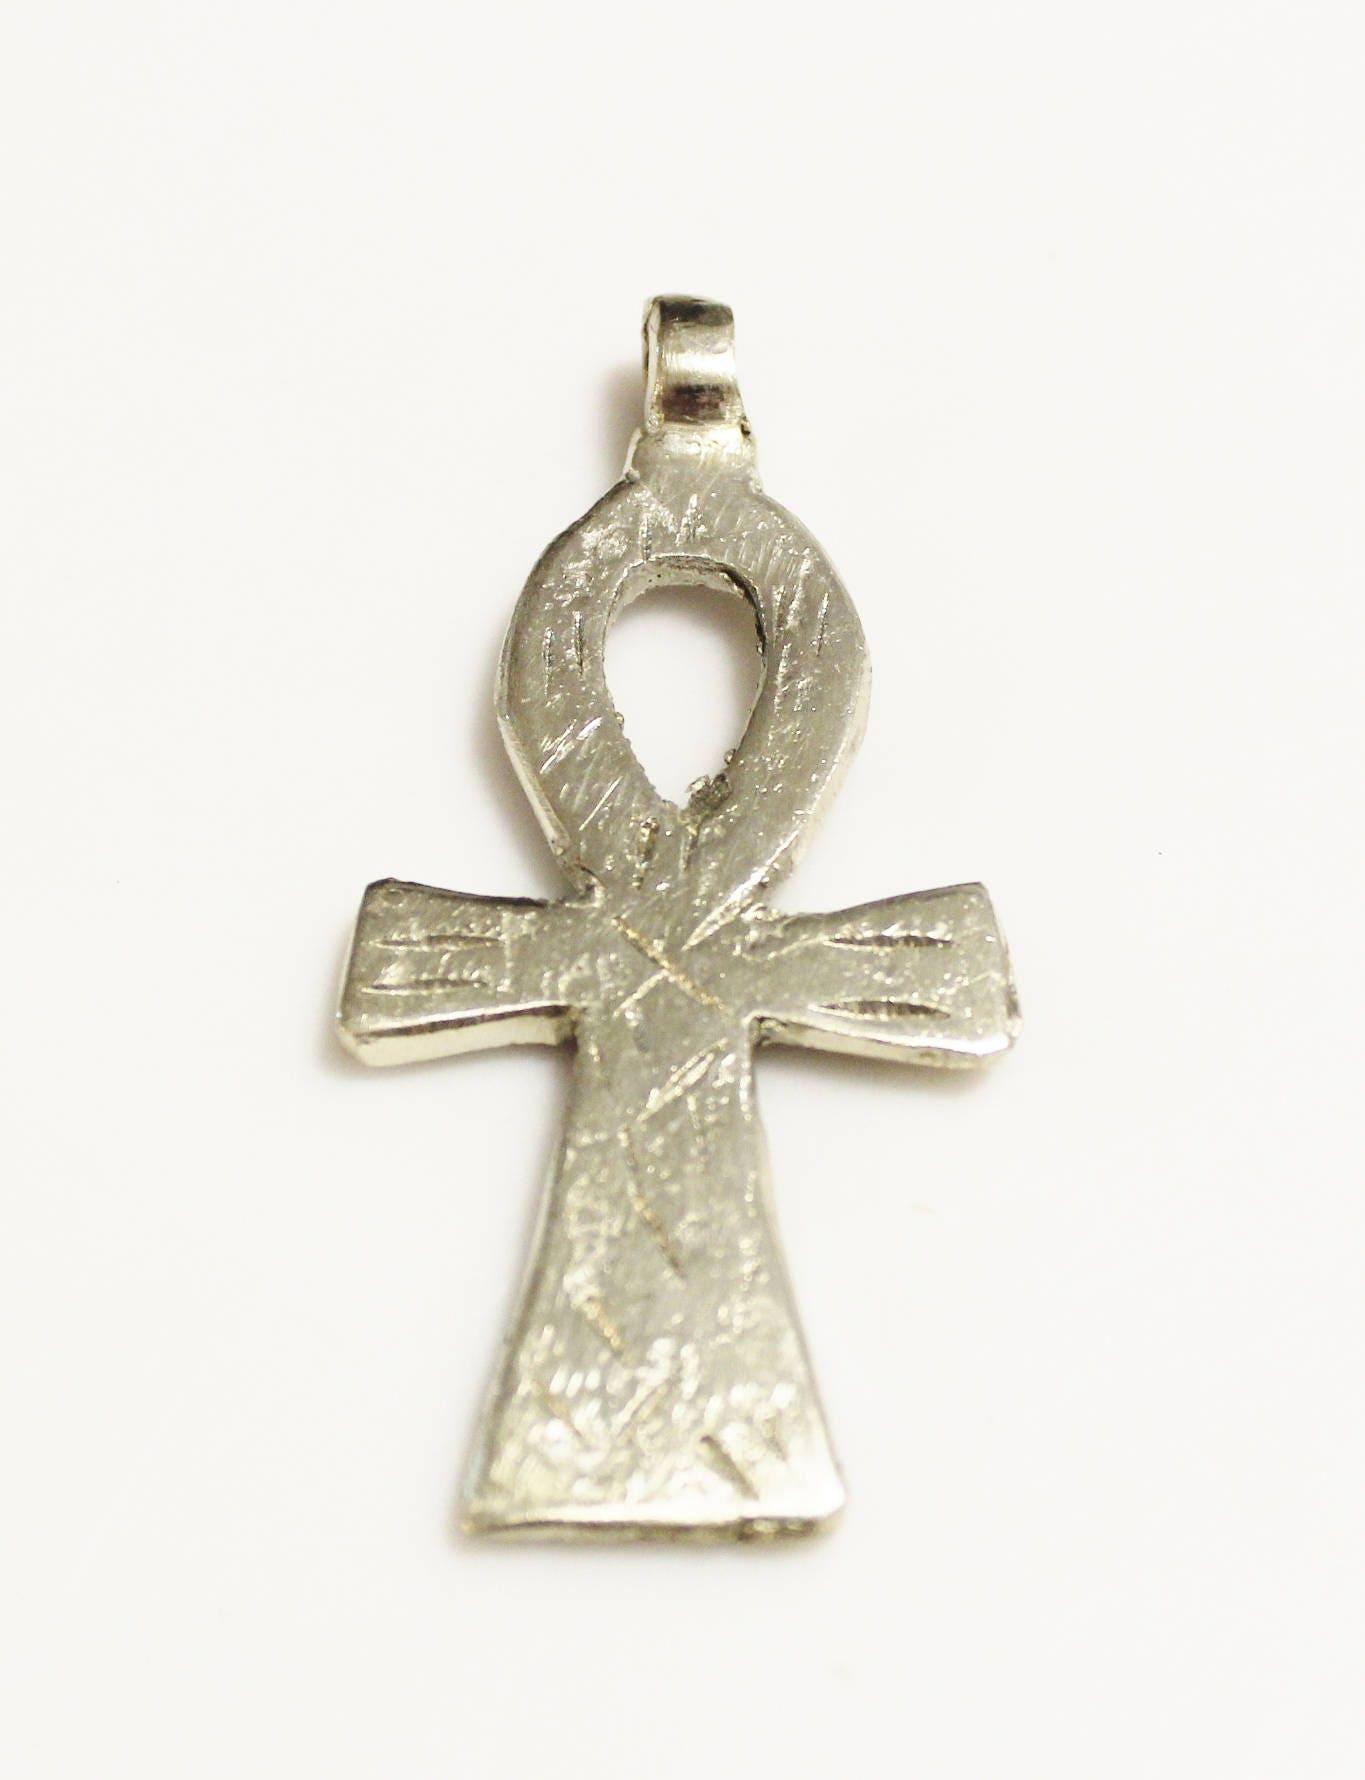 Silver ethiopian ankh cross pendant key of life symbol pendant sold by colorsquare buycottarizona Images